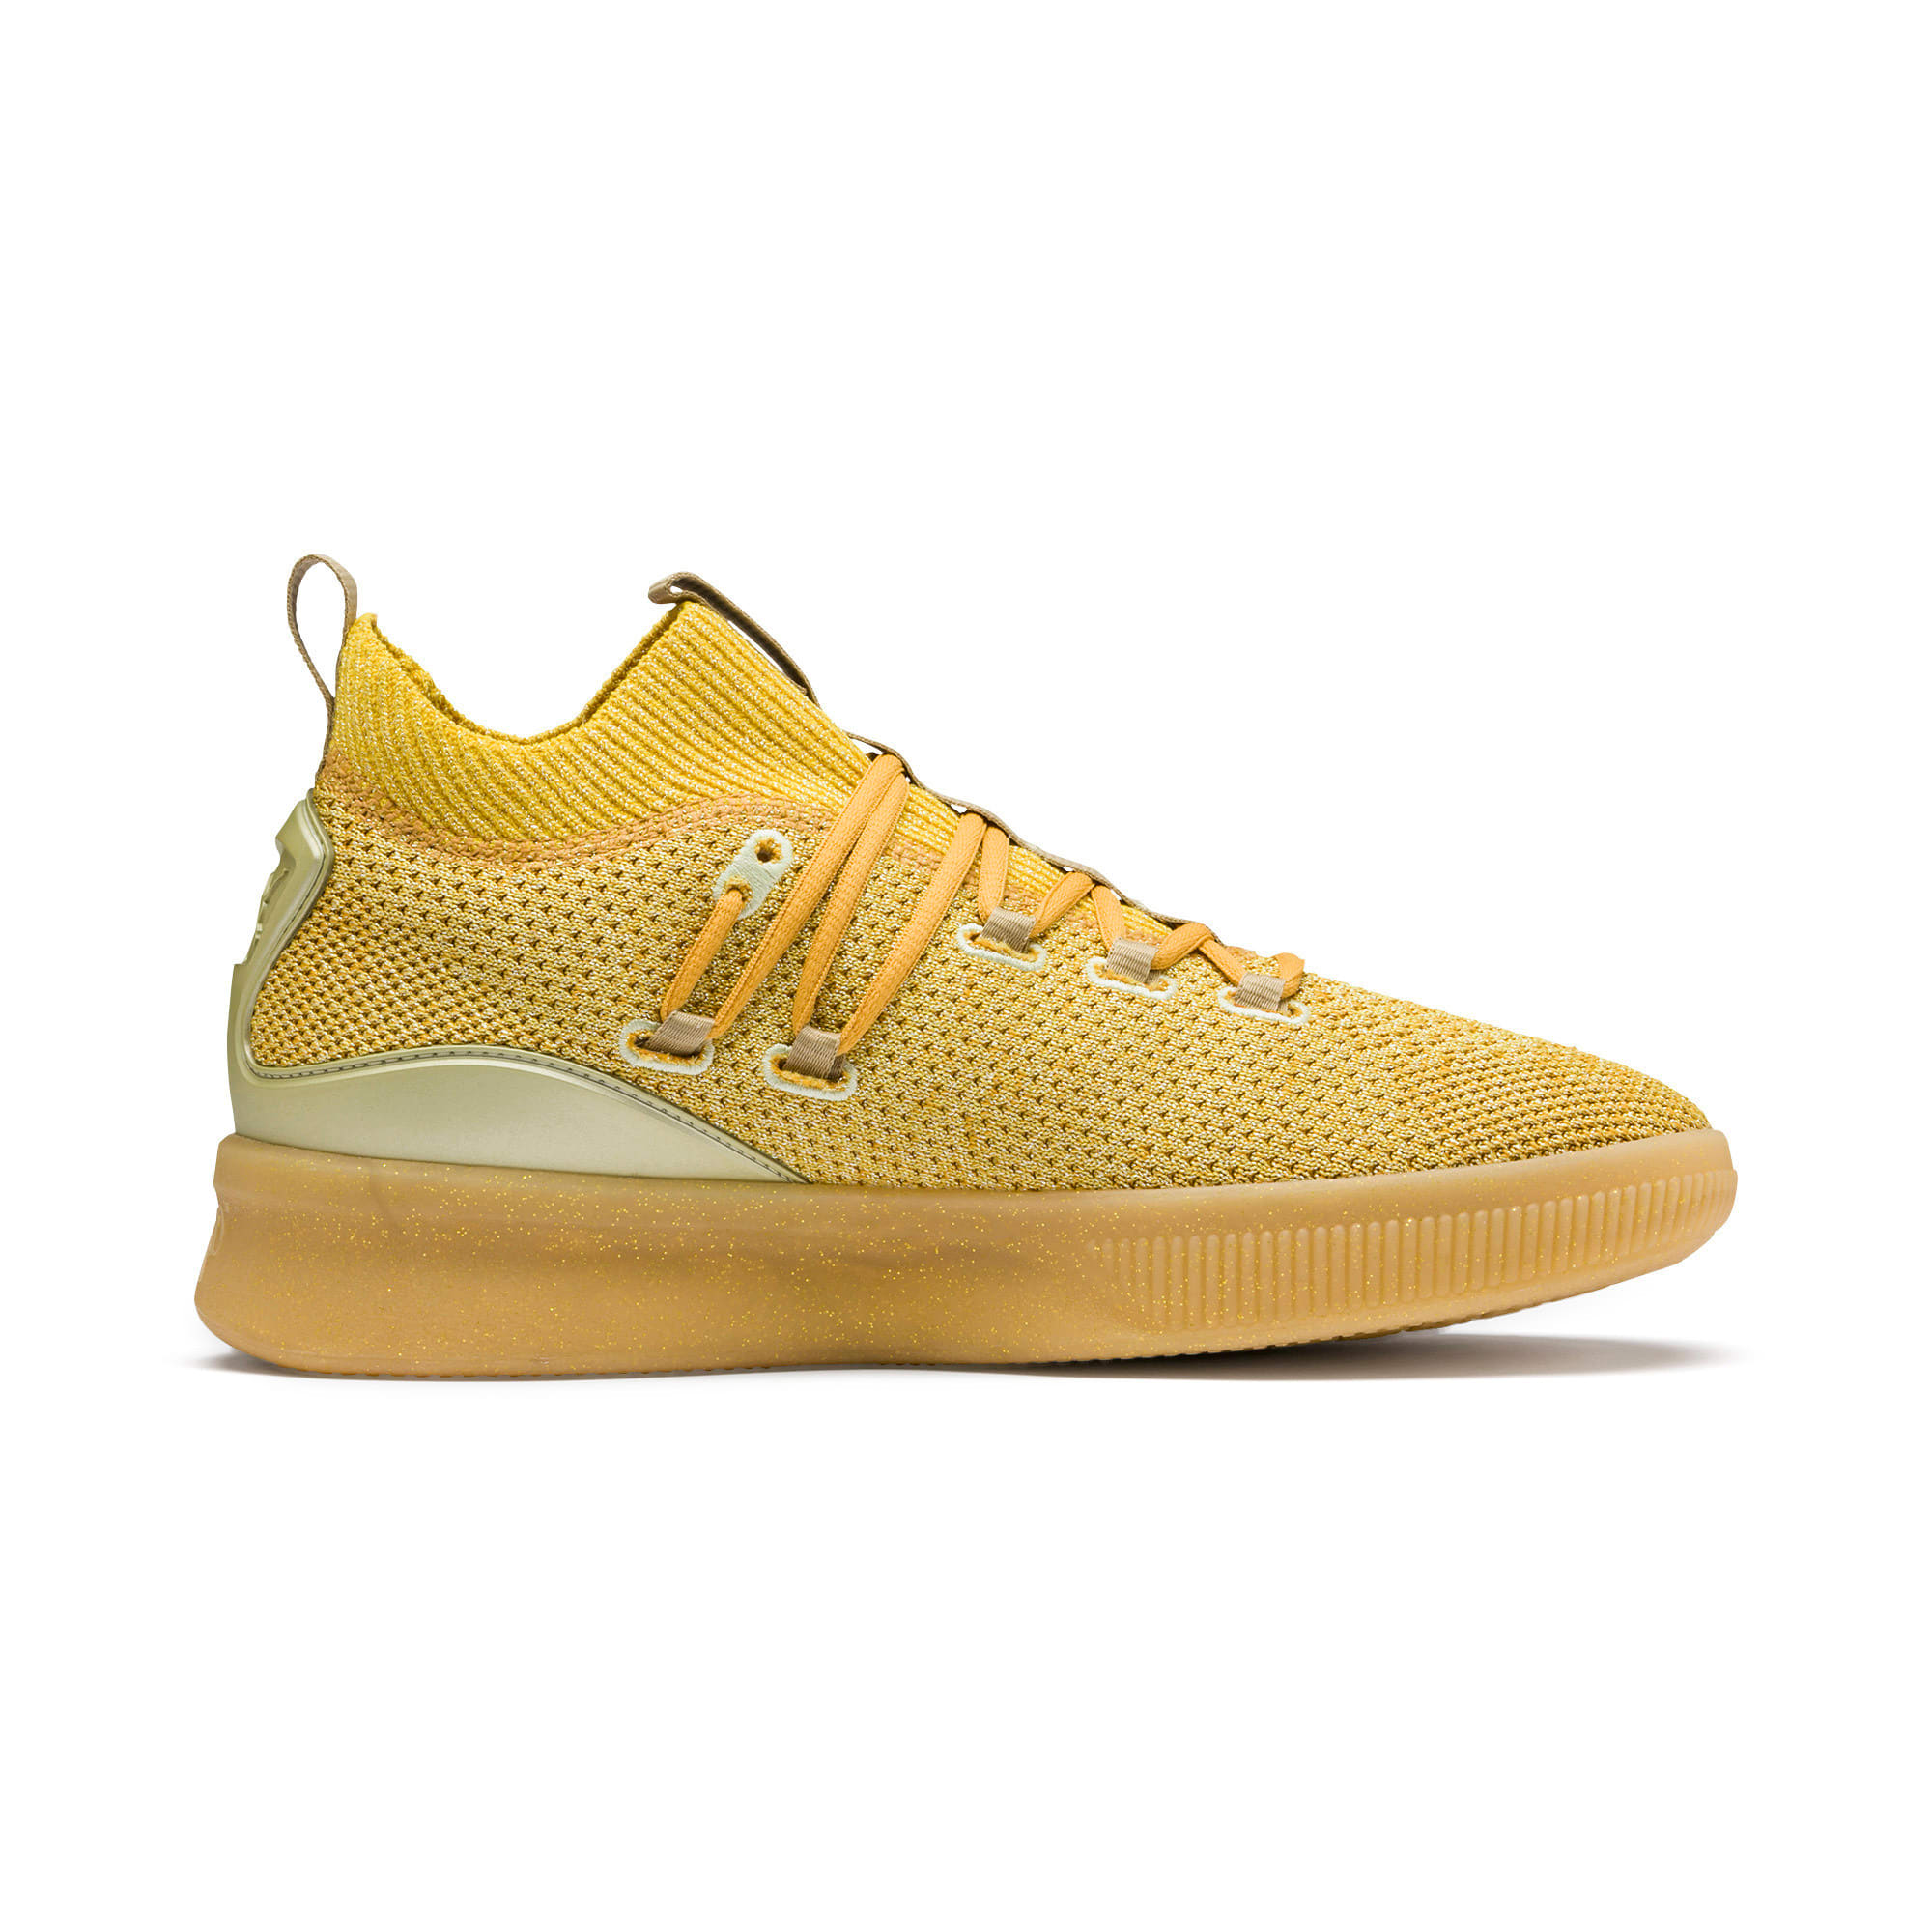 Thumbnail 5 of Clyde Court Title Run Basketball Shoes, Metallic Gold, medium